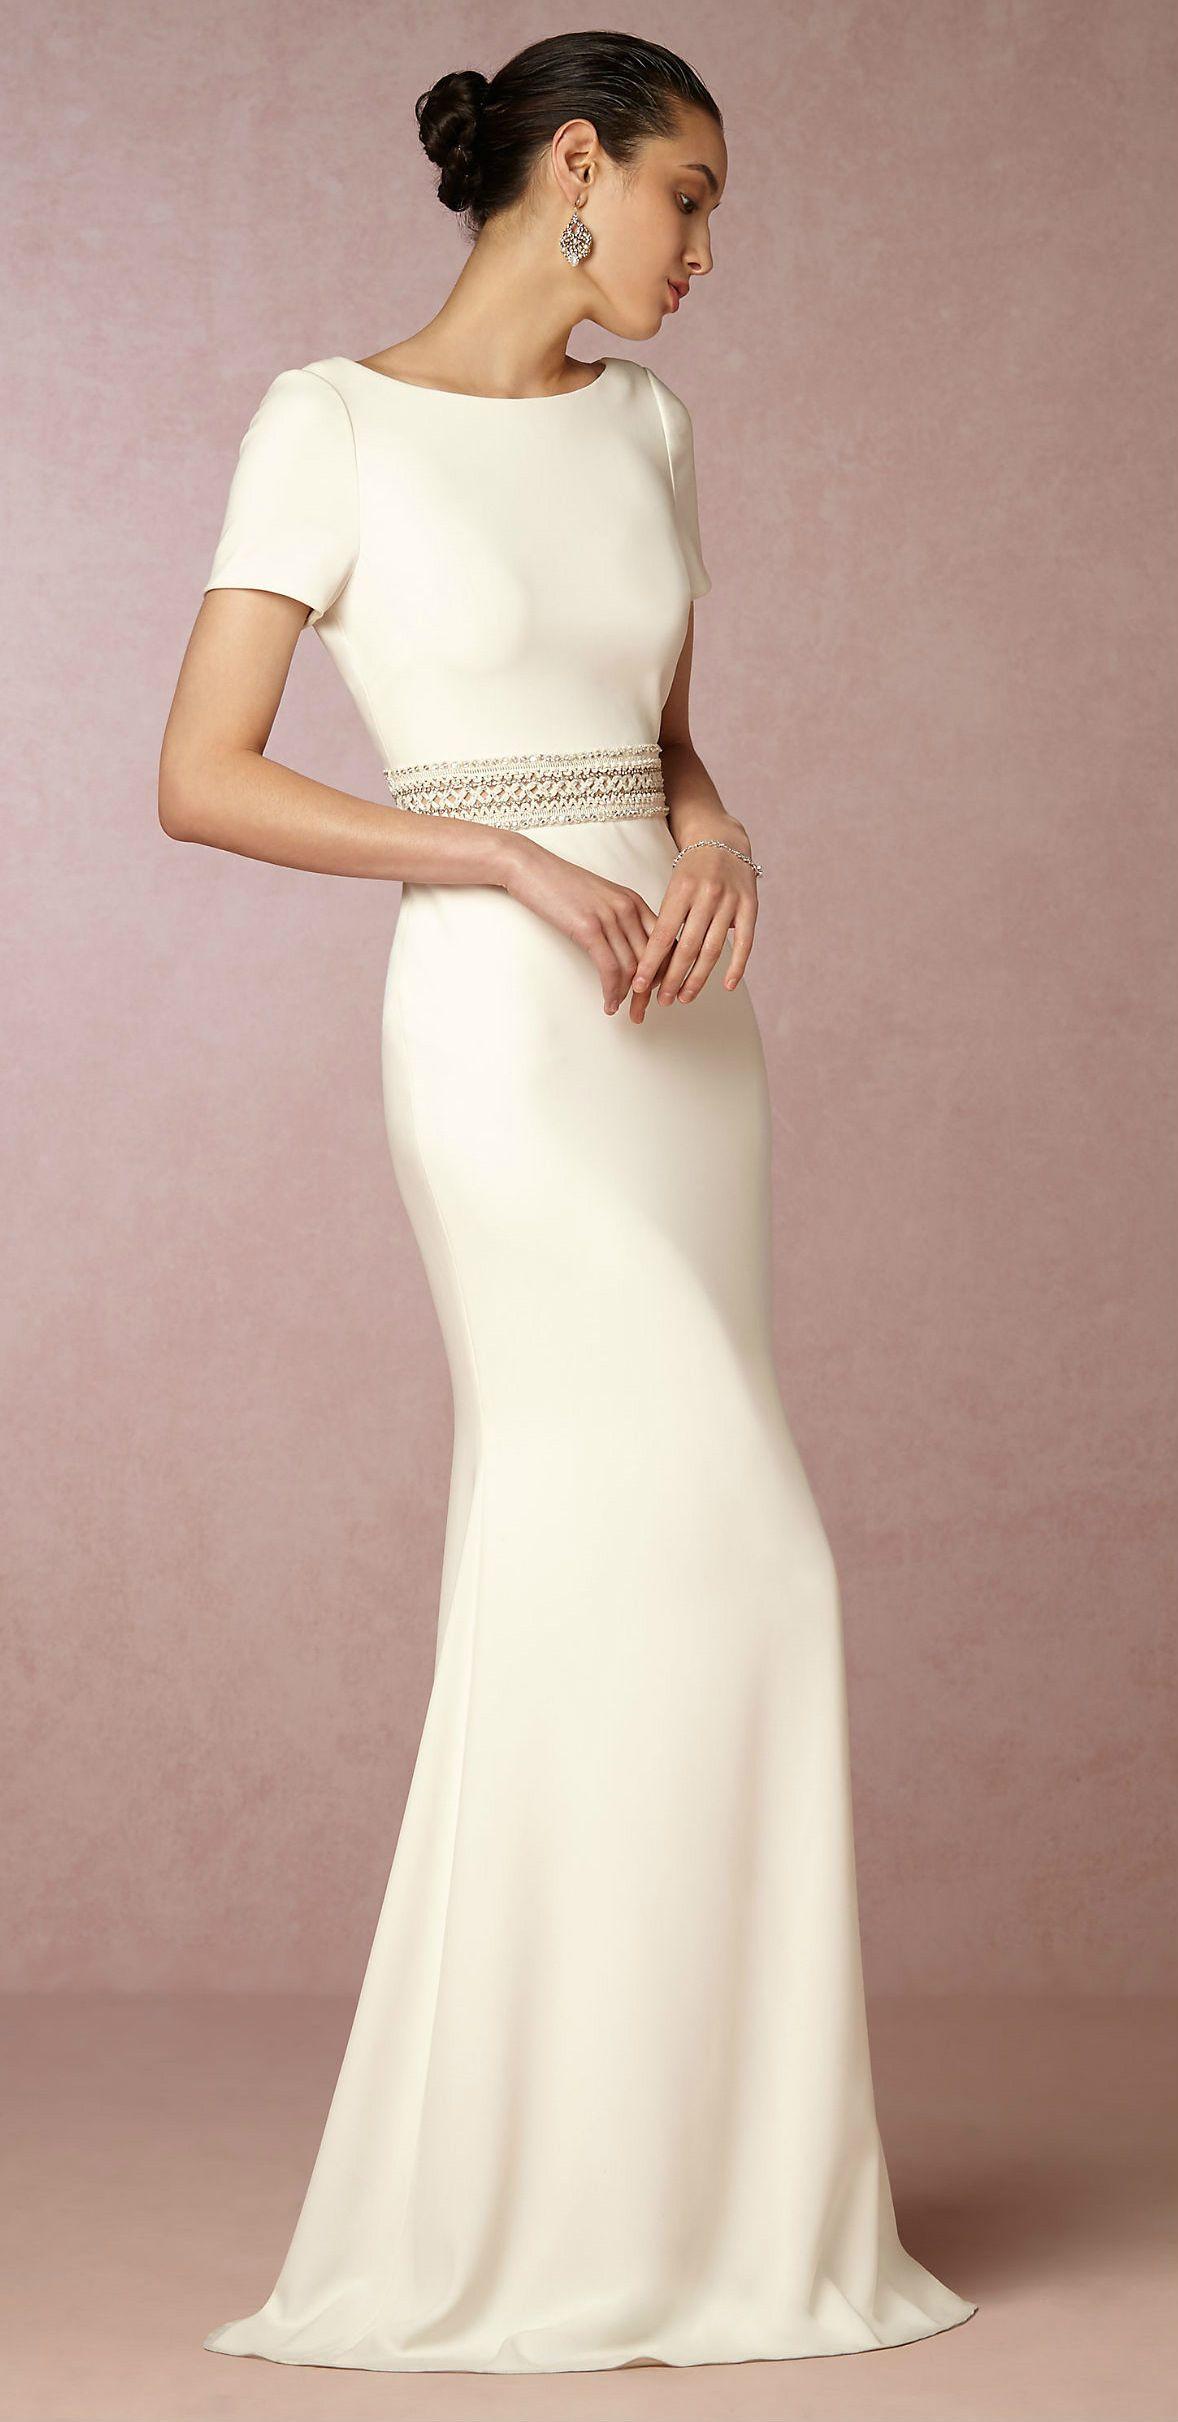 ab2cfaa6b9f Short sleeve sleek wedding dress. New wedding dresses from BHLDN. Alice Gown .